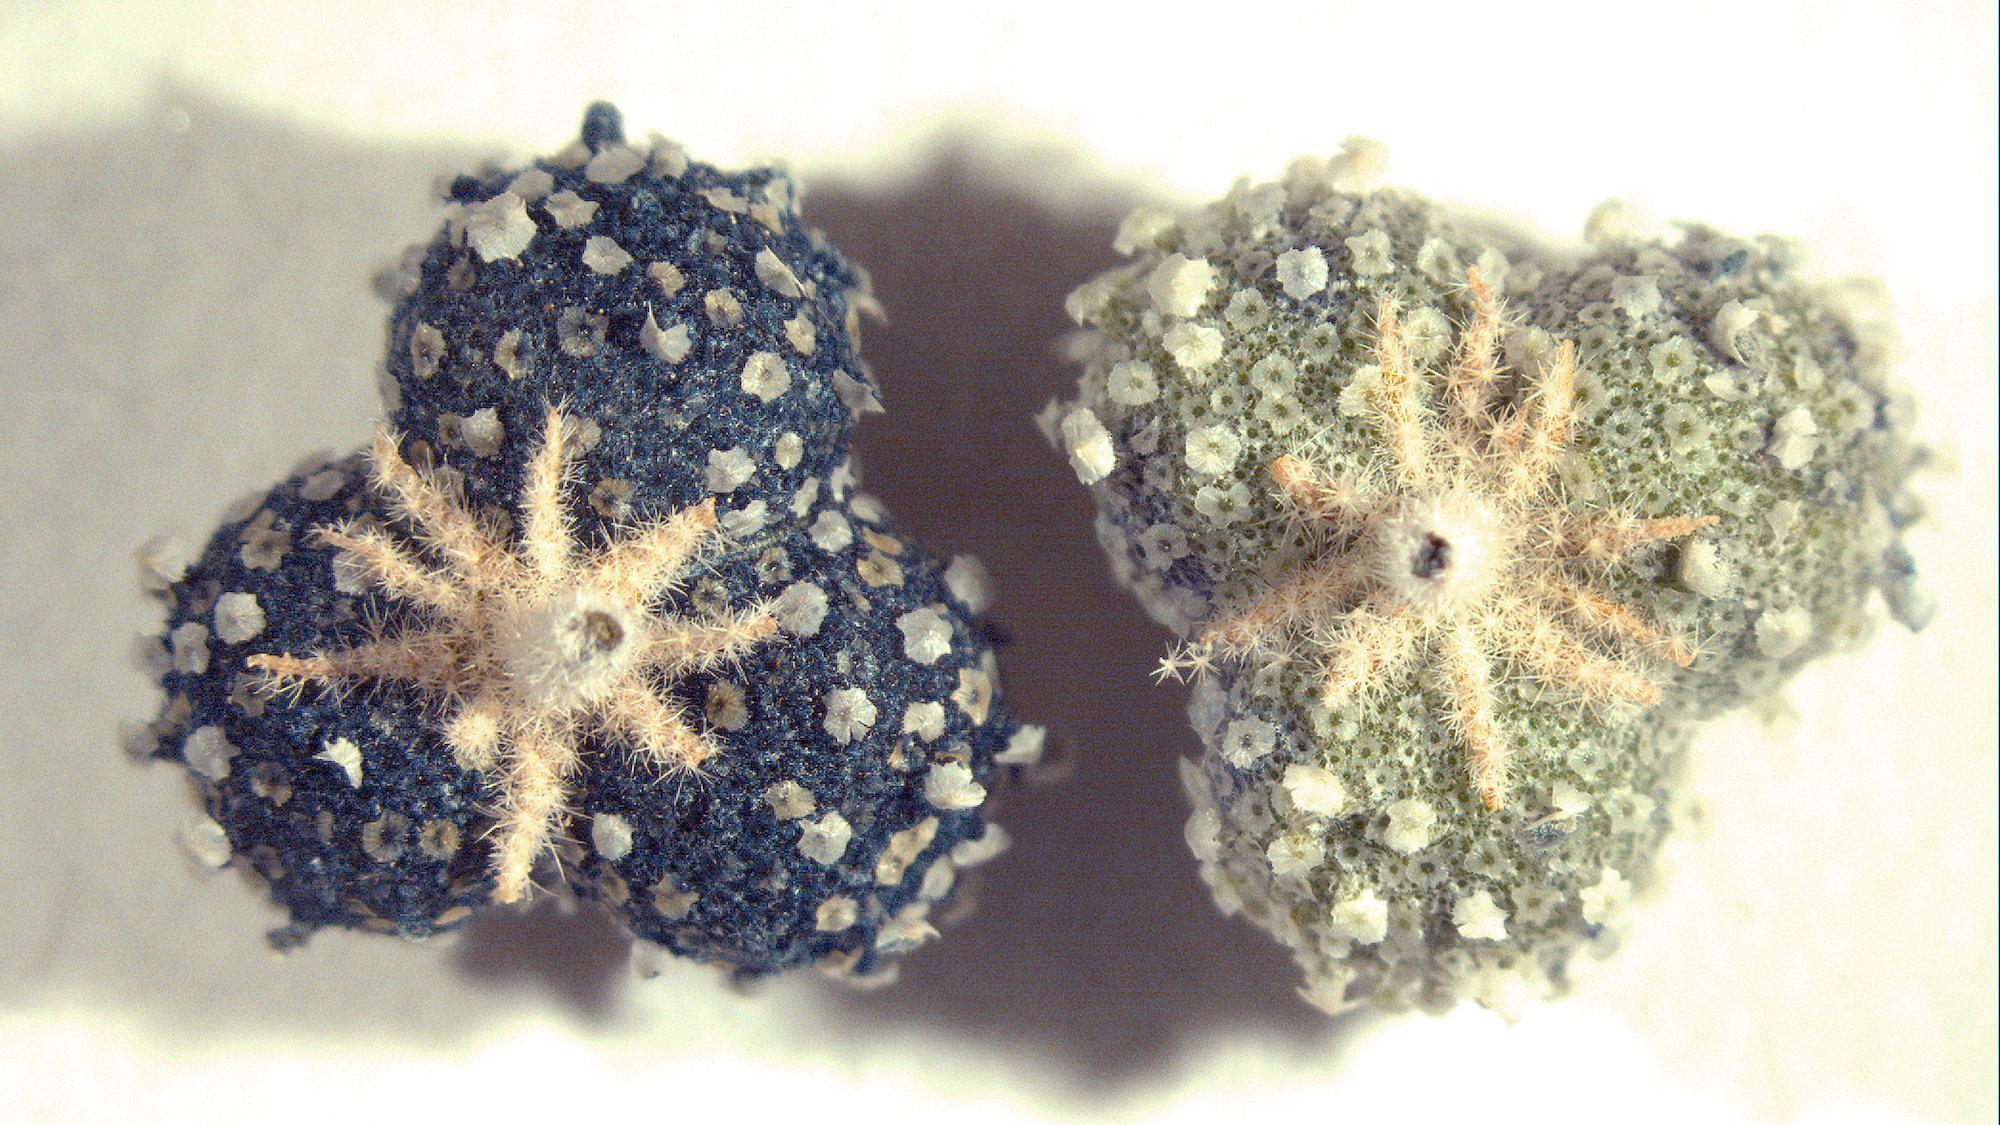 Chrozophora tinctoria